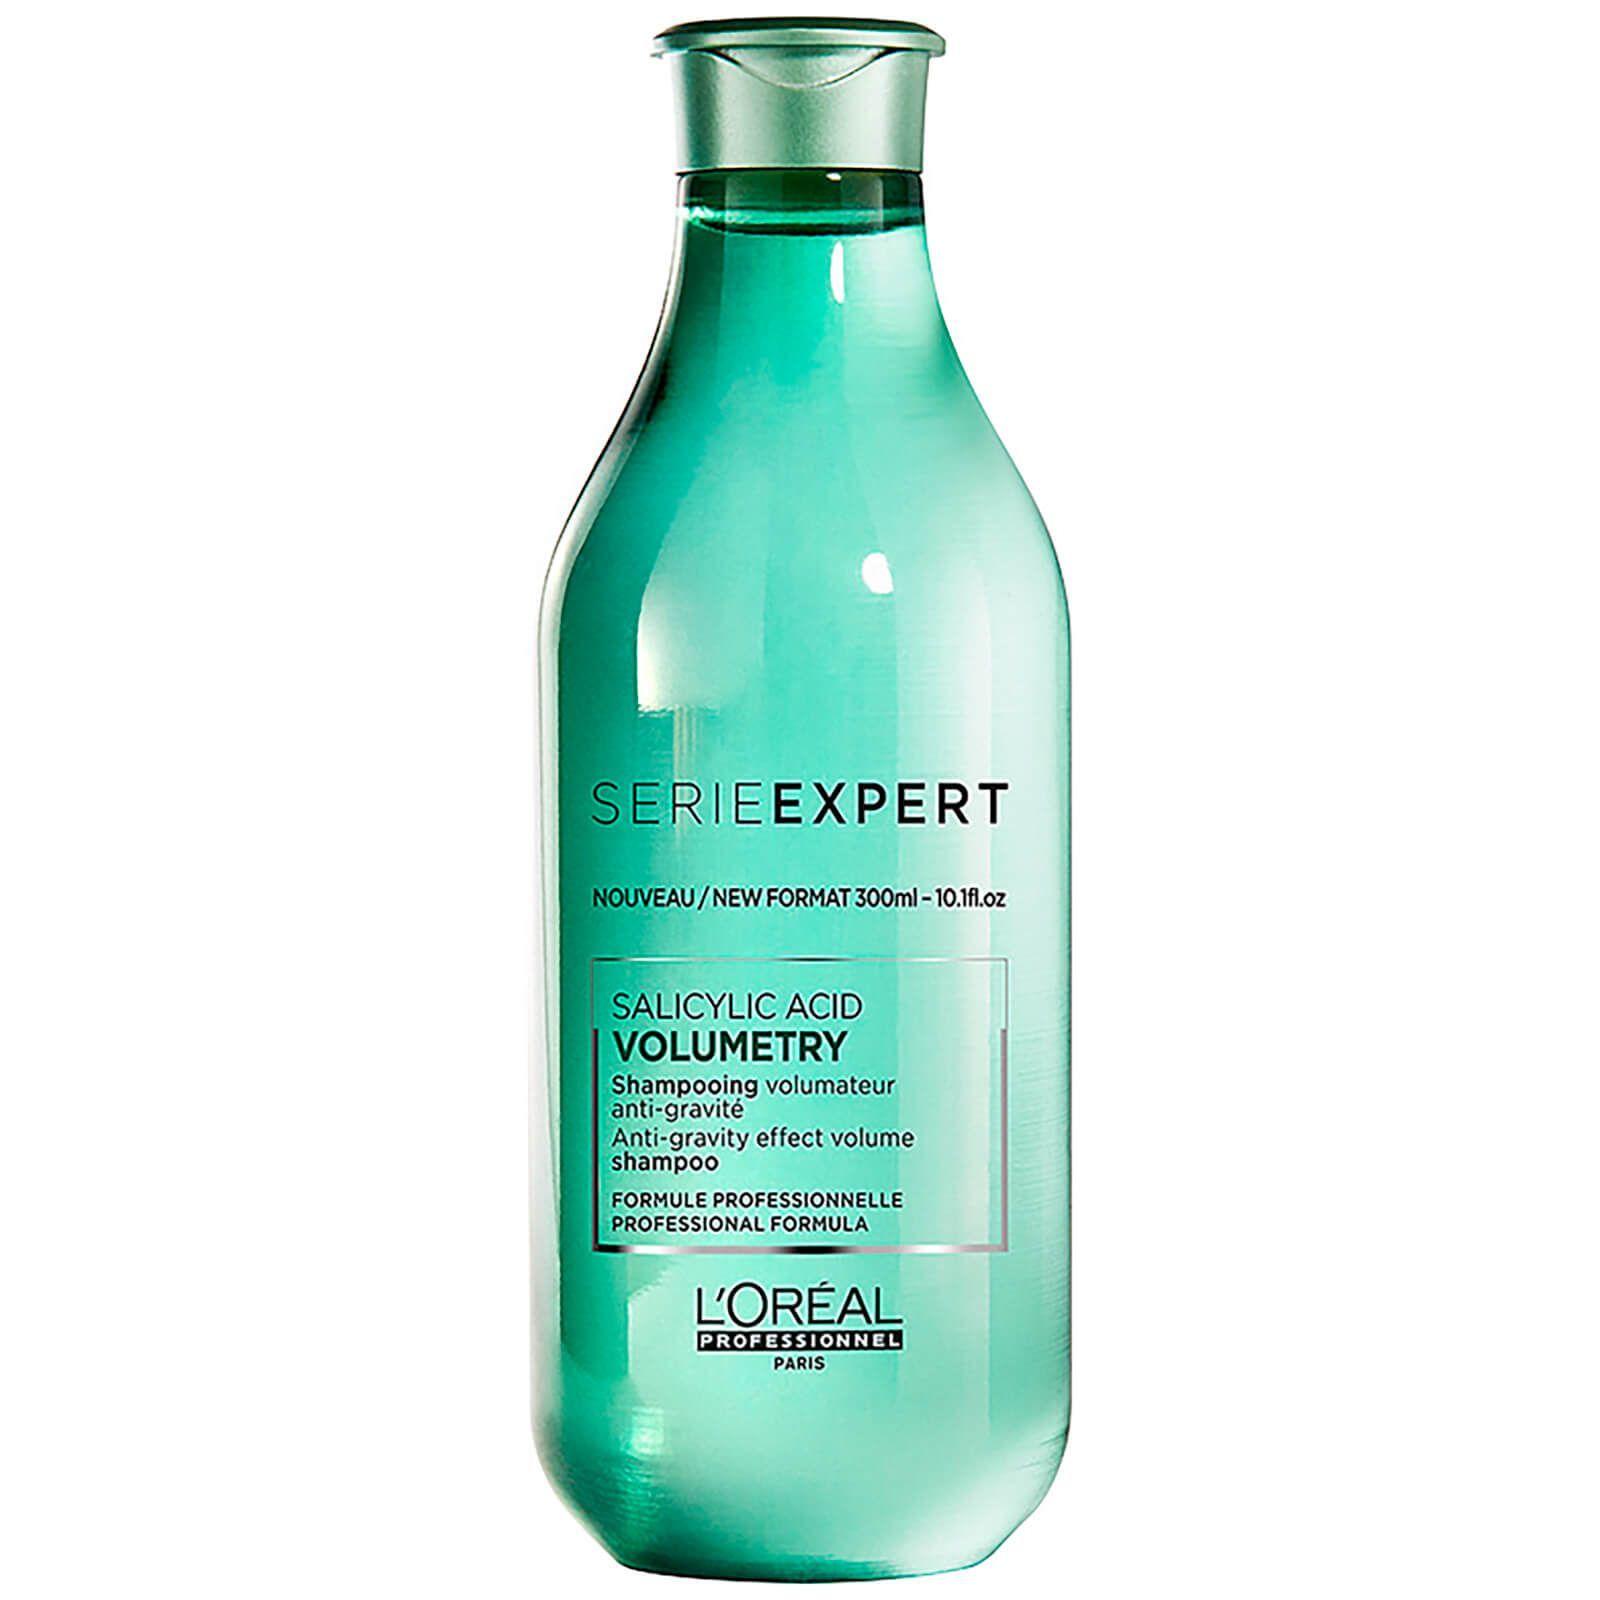 L'oreal Professionnel Volumetry Shampoo - 300ml